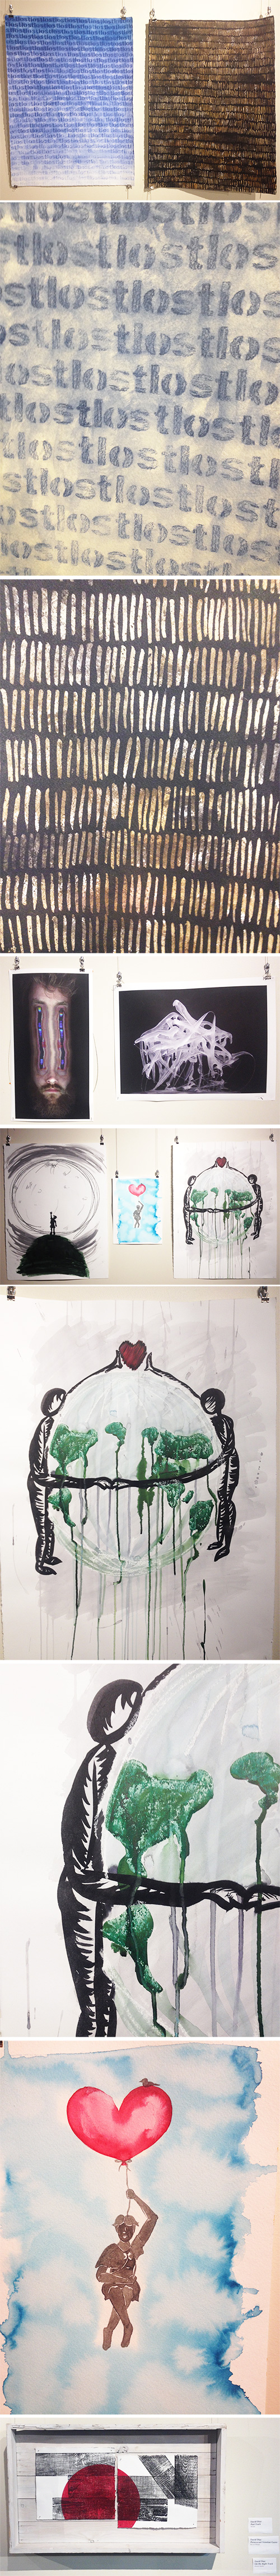 Art1-sm